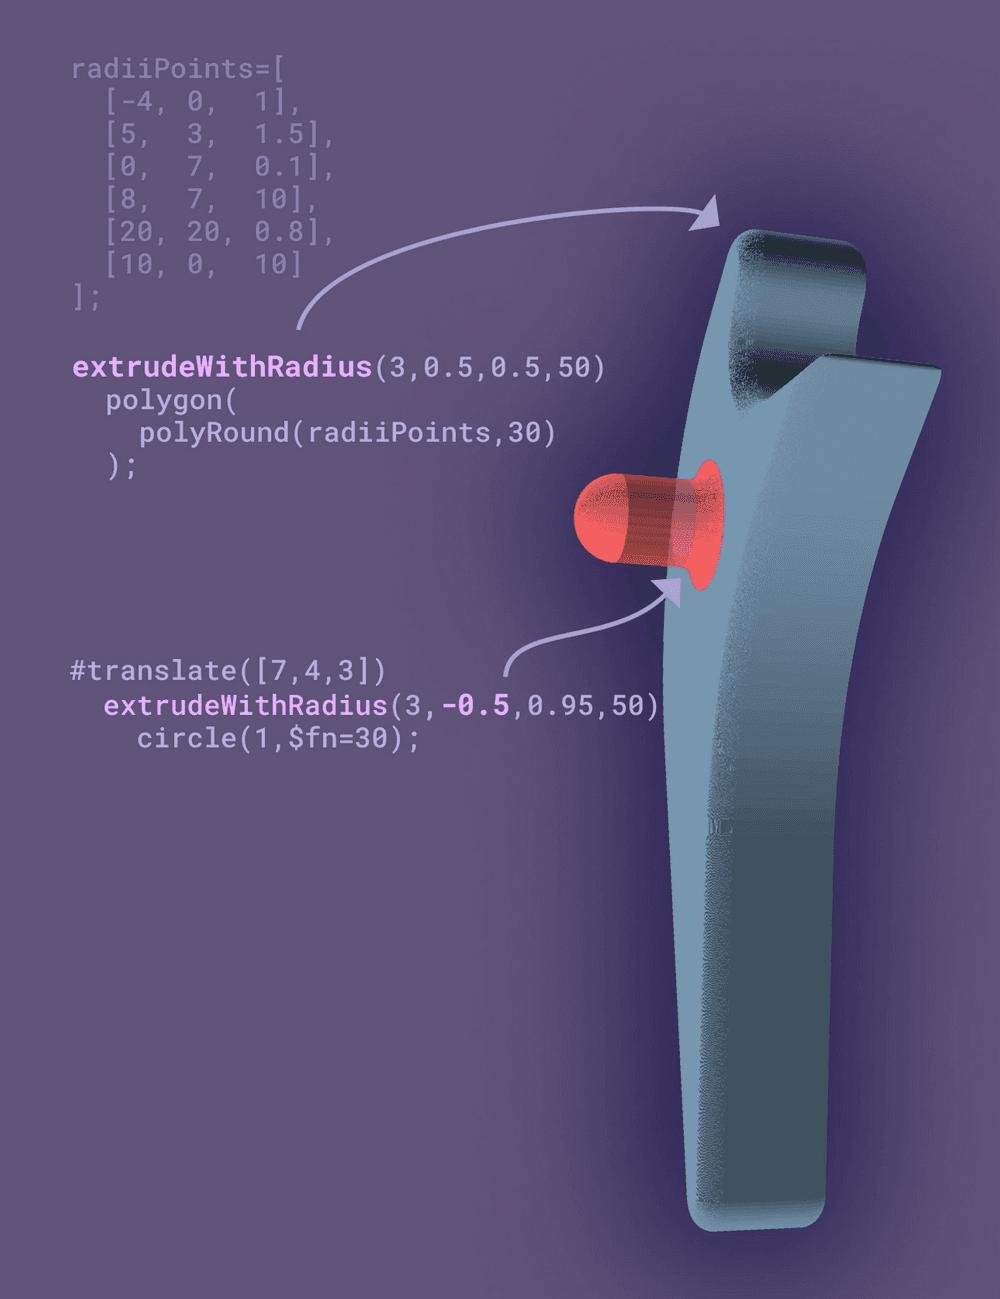 extrudeWithRadius api example